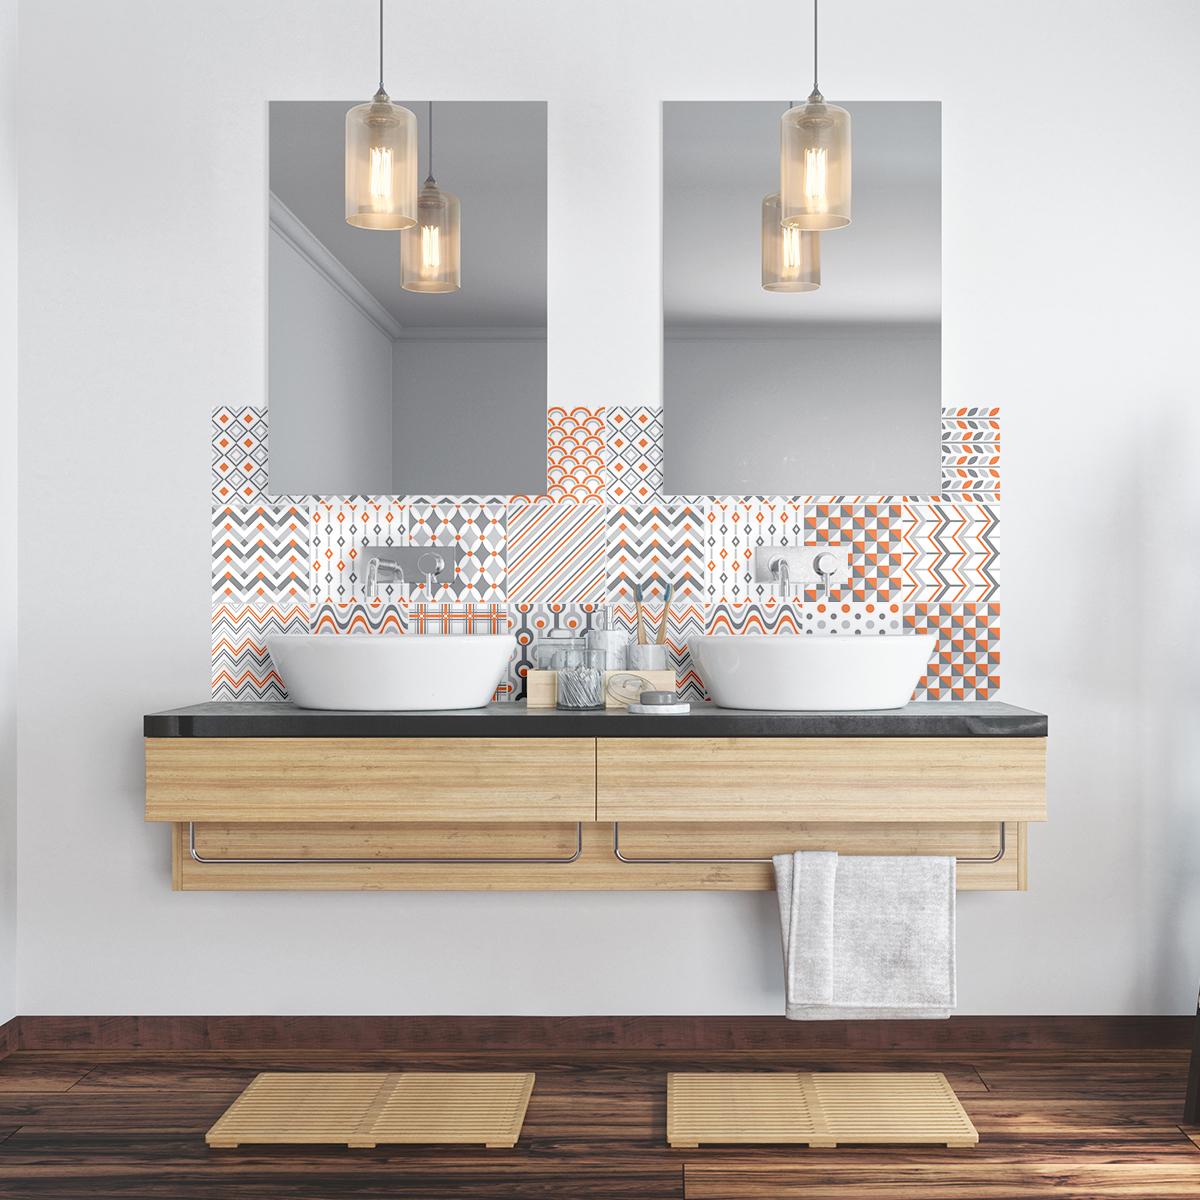 24 stickers carreaux de ciment ethnique makati cuisine carrelages ambiance sticker. Black Bedroom Furniture Sets. Home Design Ideas